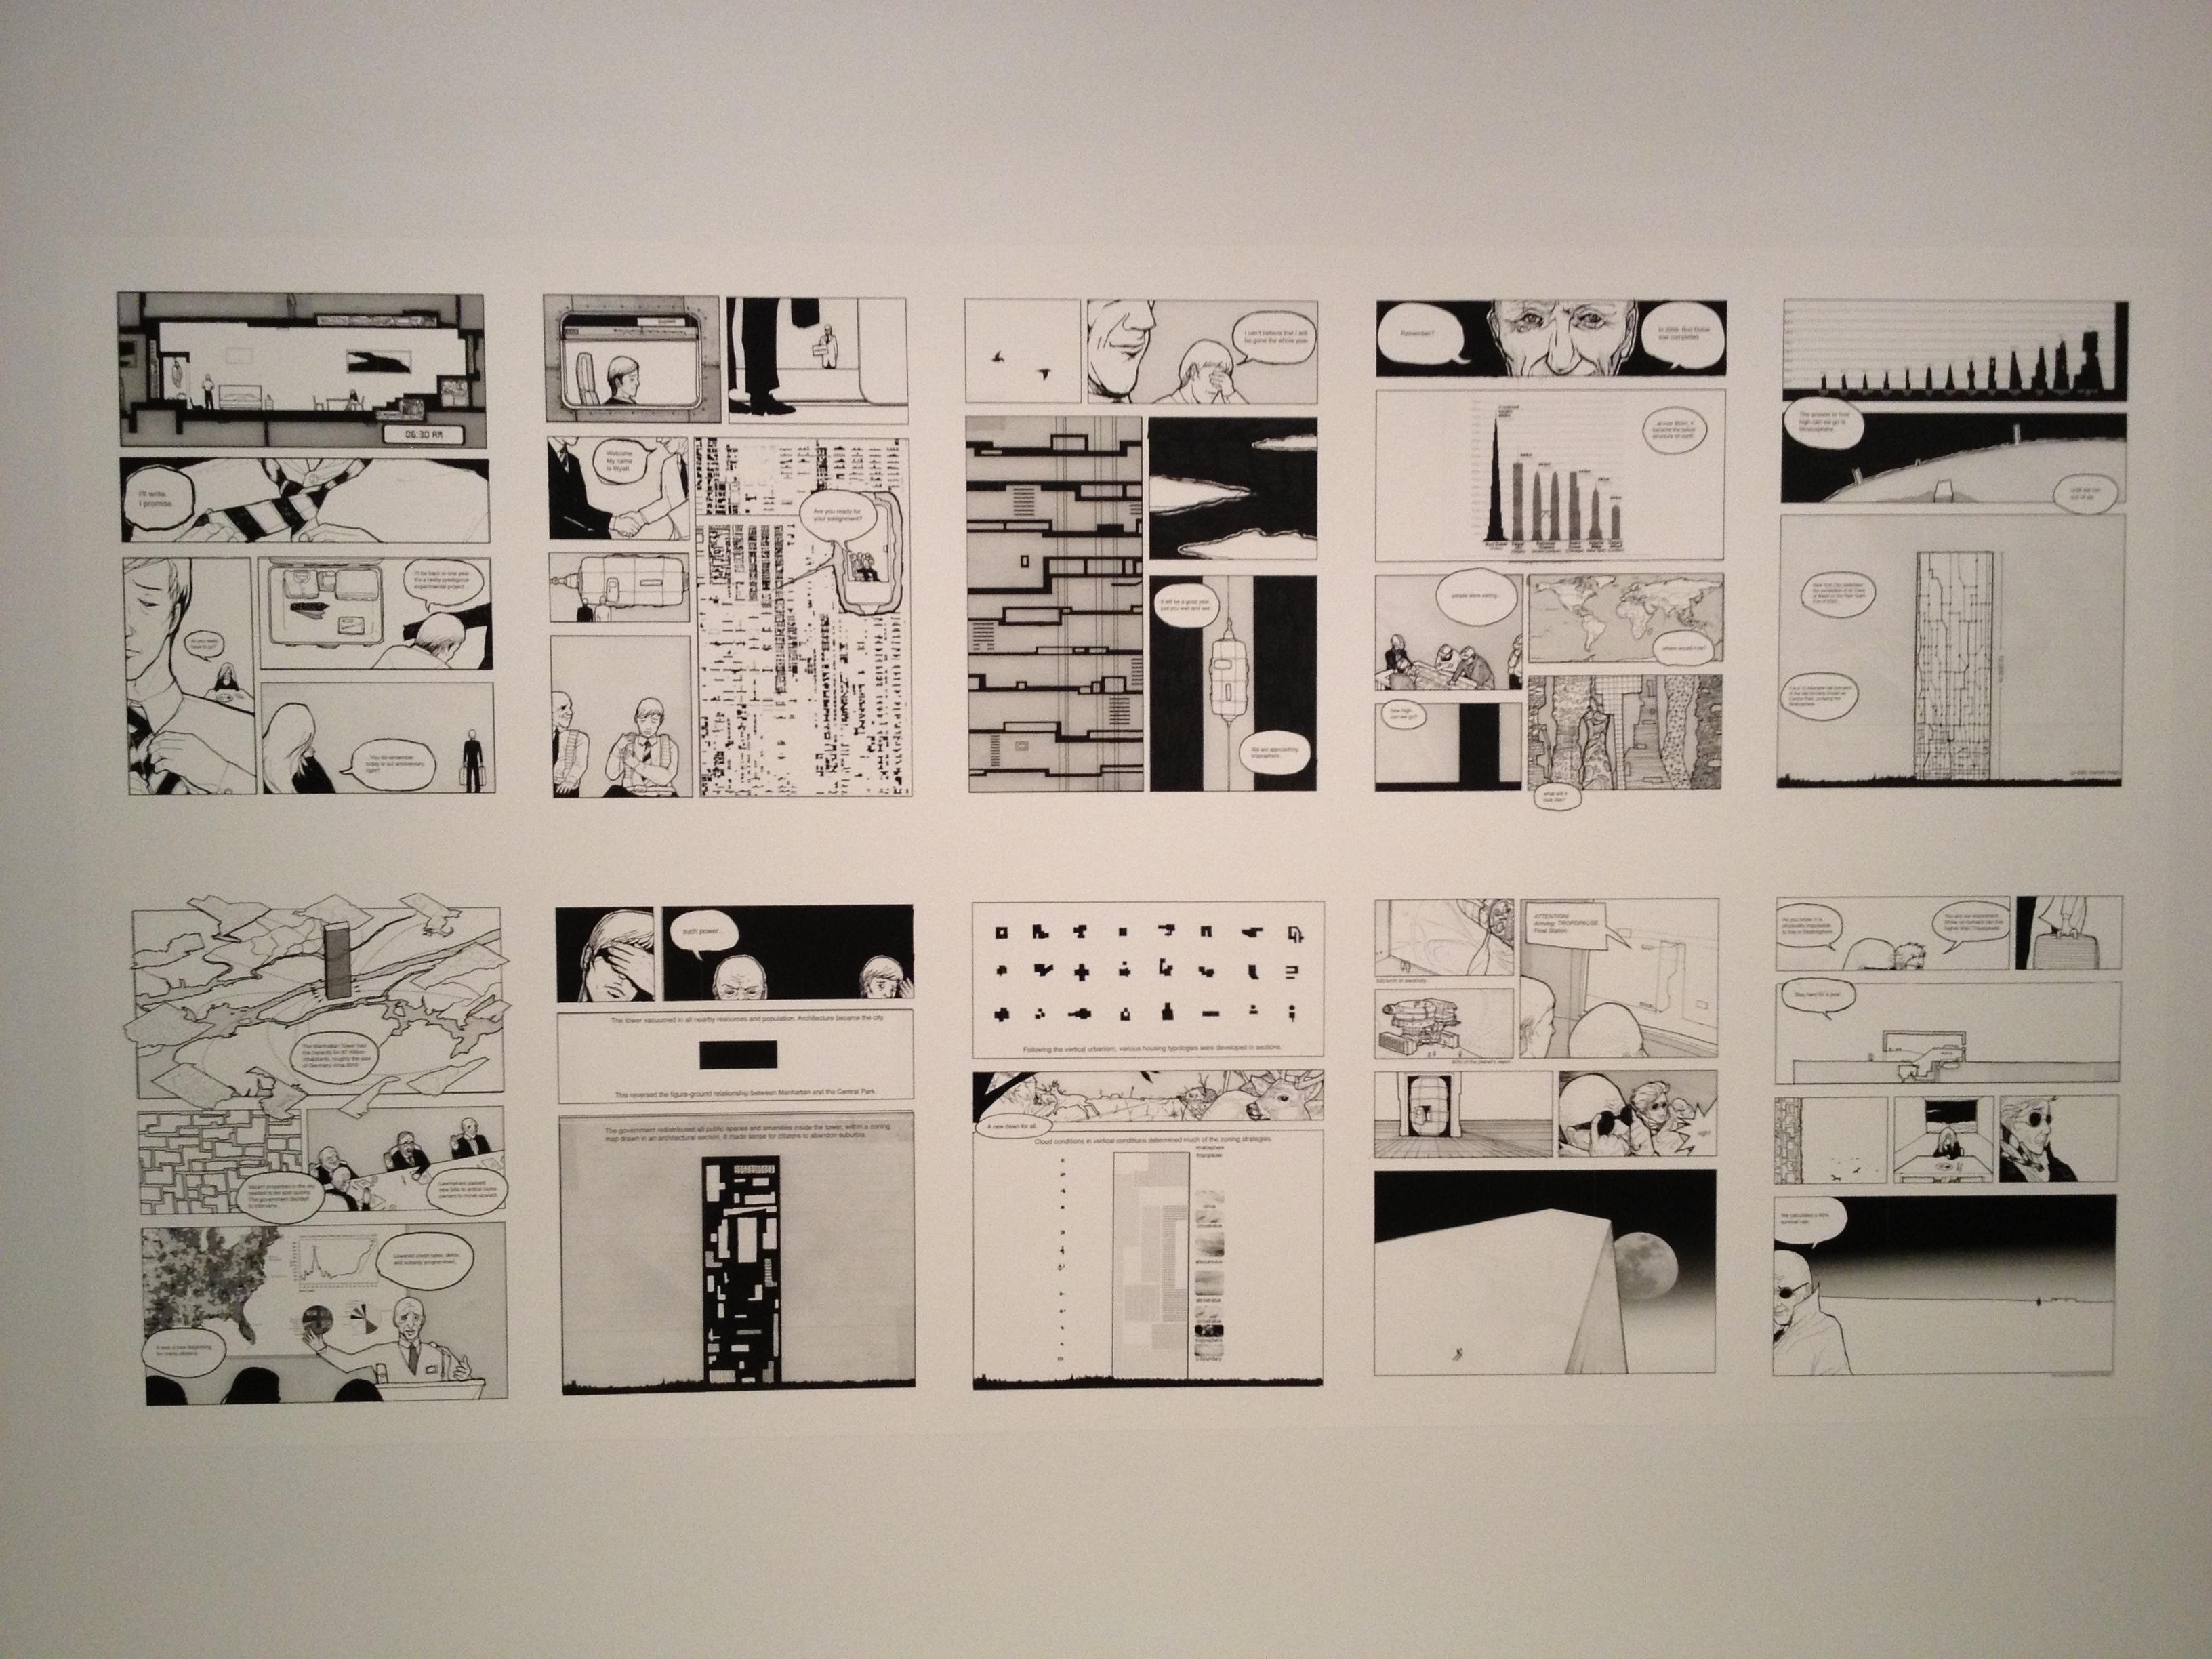 More fabricating place -- Jiminez Lai, whom I saw last year at SVA, @ the Bildmuseet